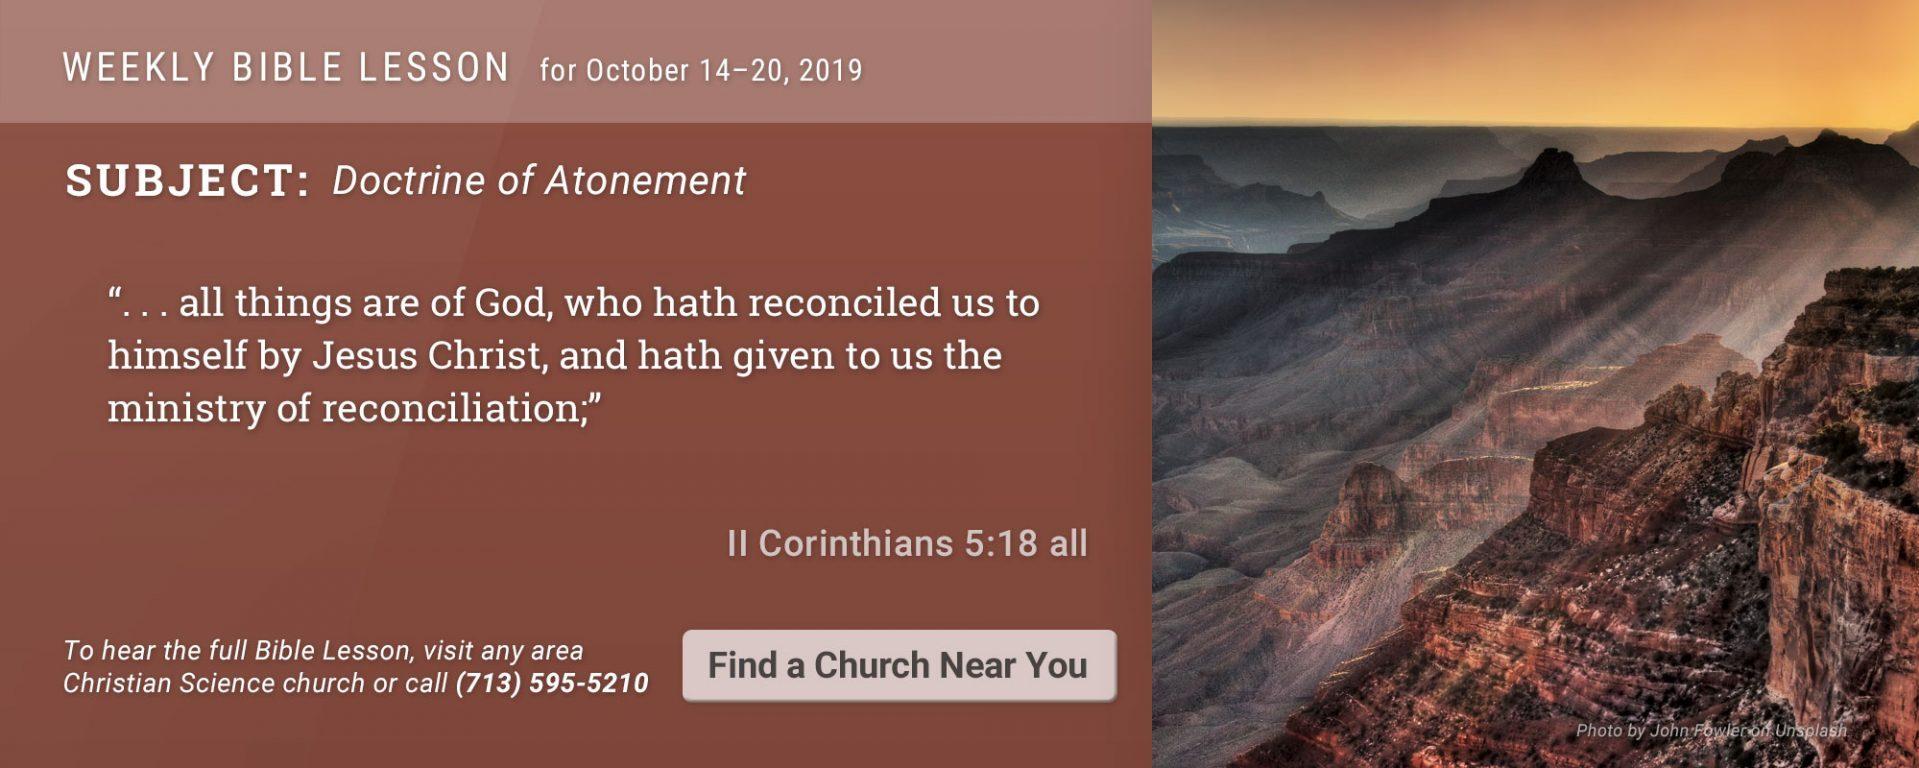 Bible Lesson Golden Text 20191014